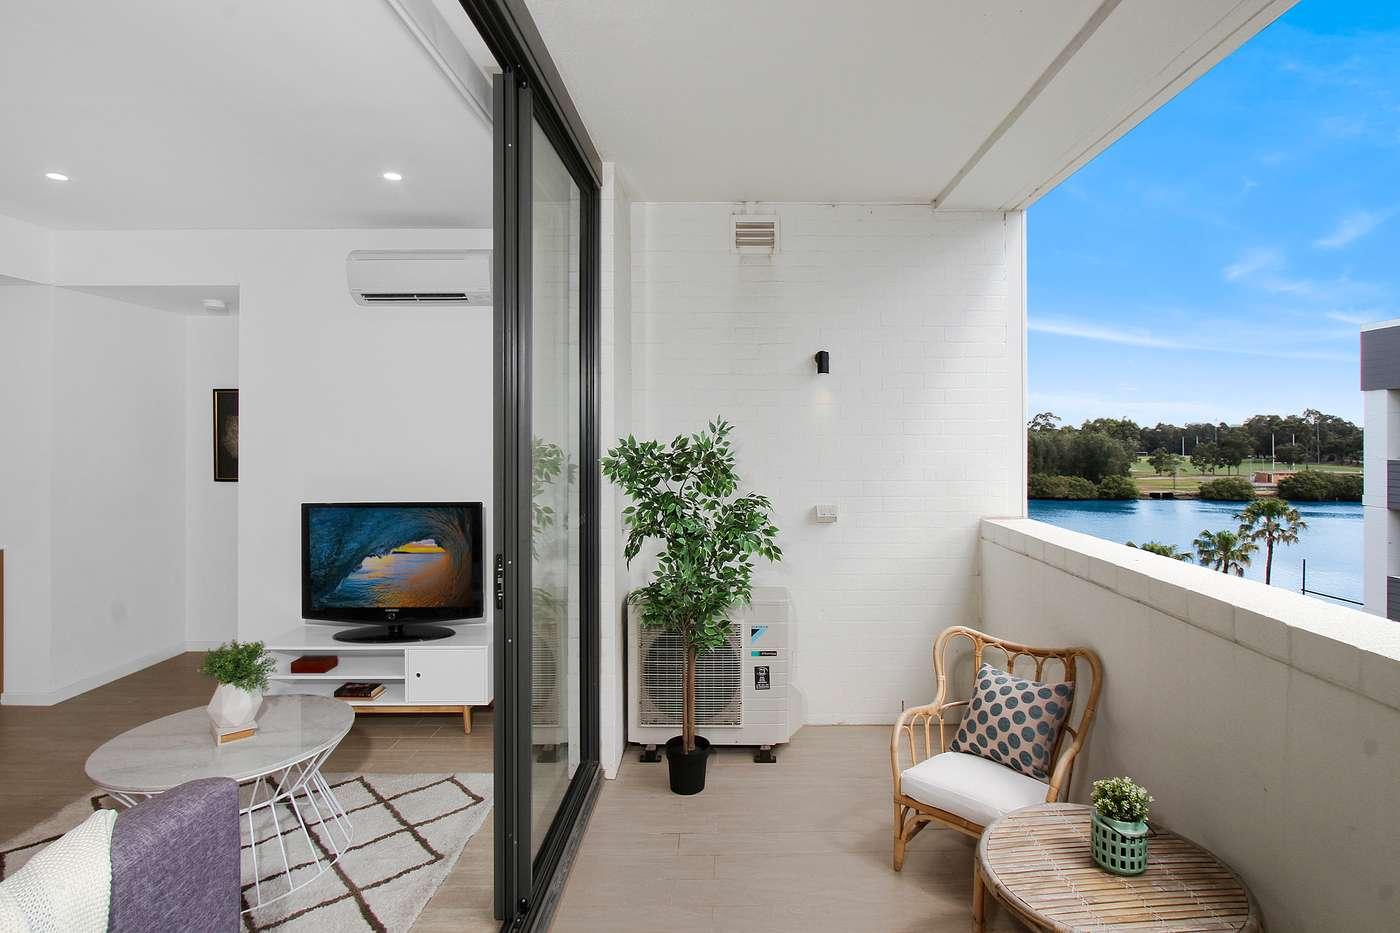 Main view of Homely apartment listing, 401/48-56 Bundarra Street, Ermington, NSW 2115